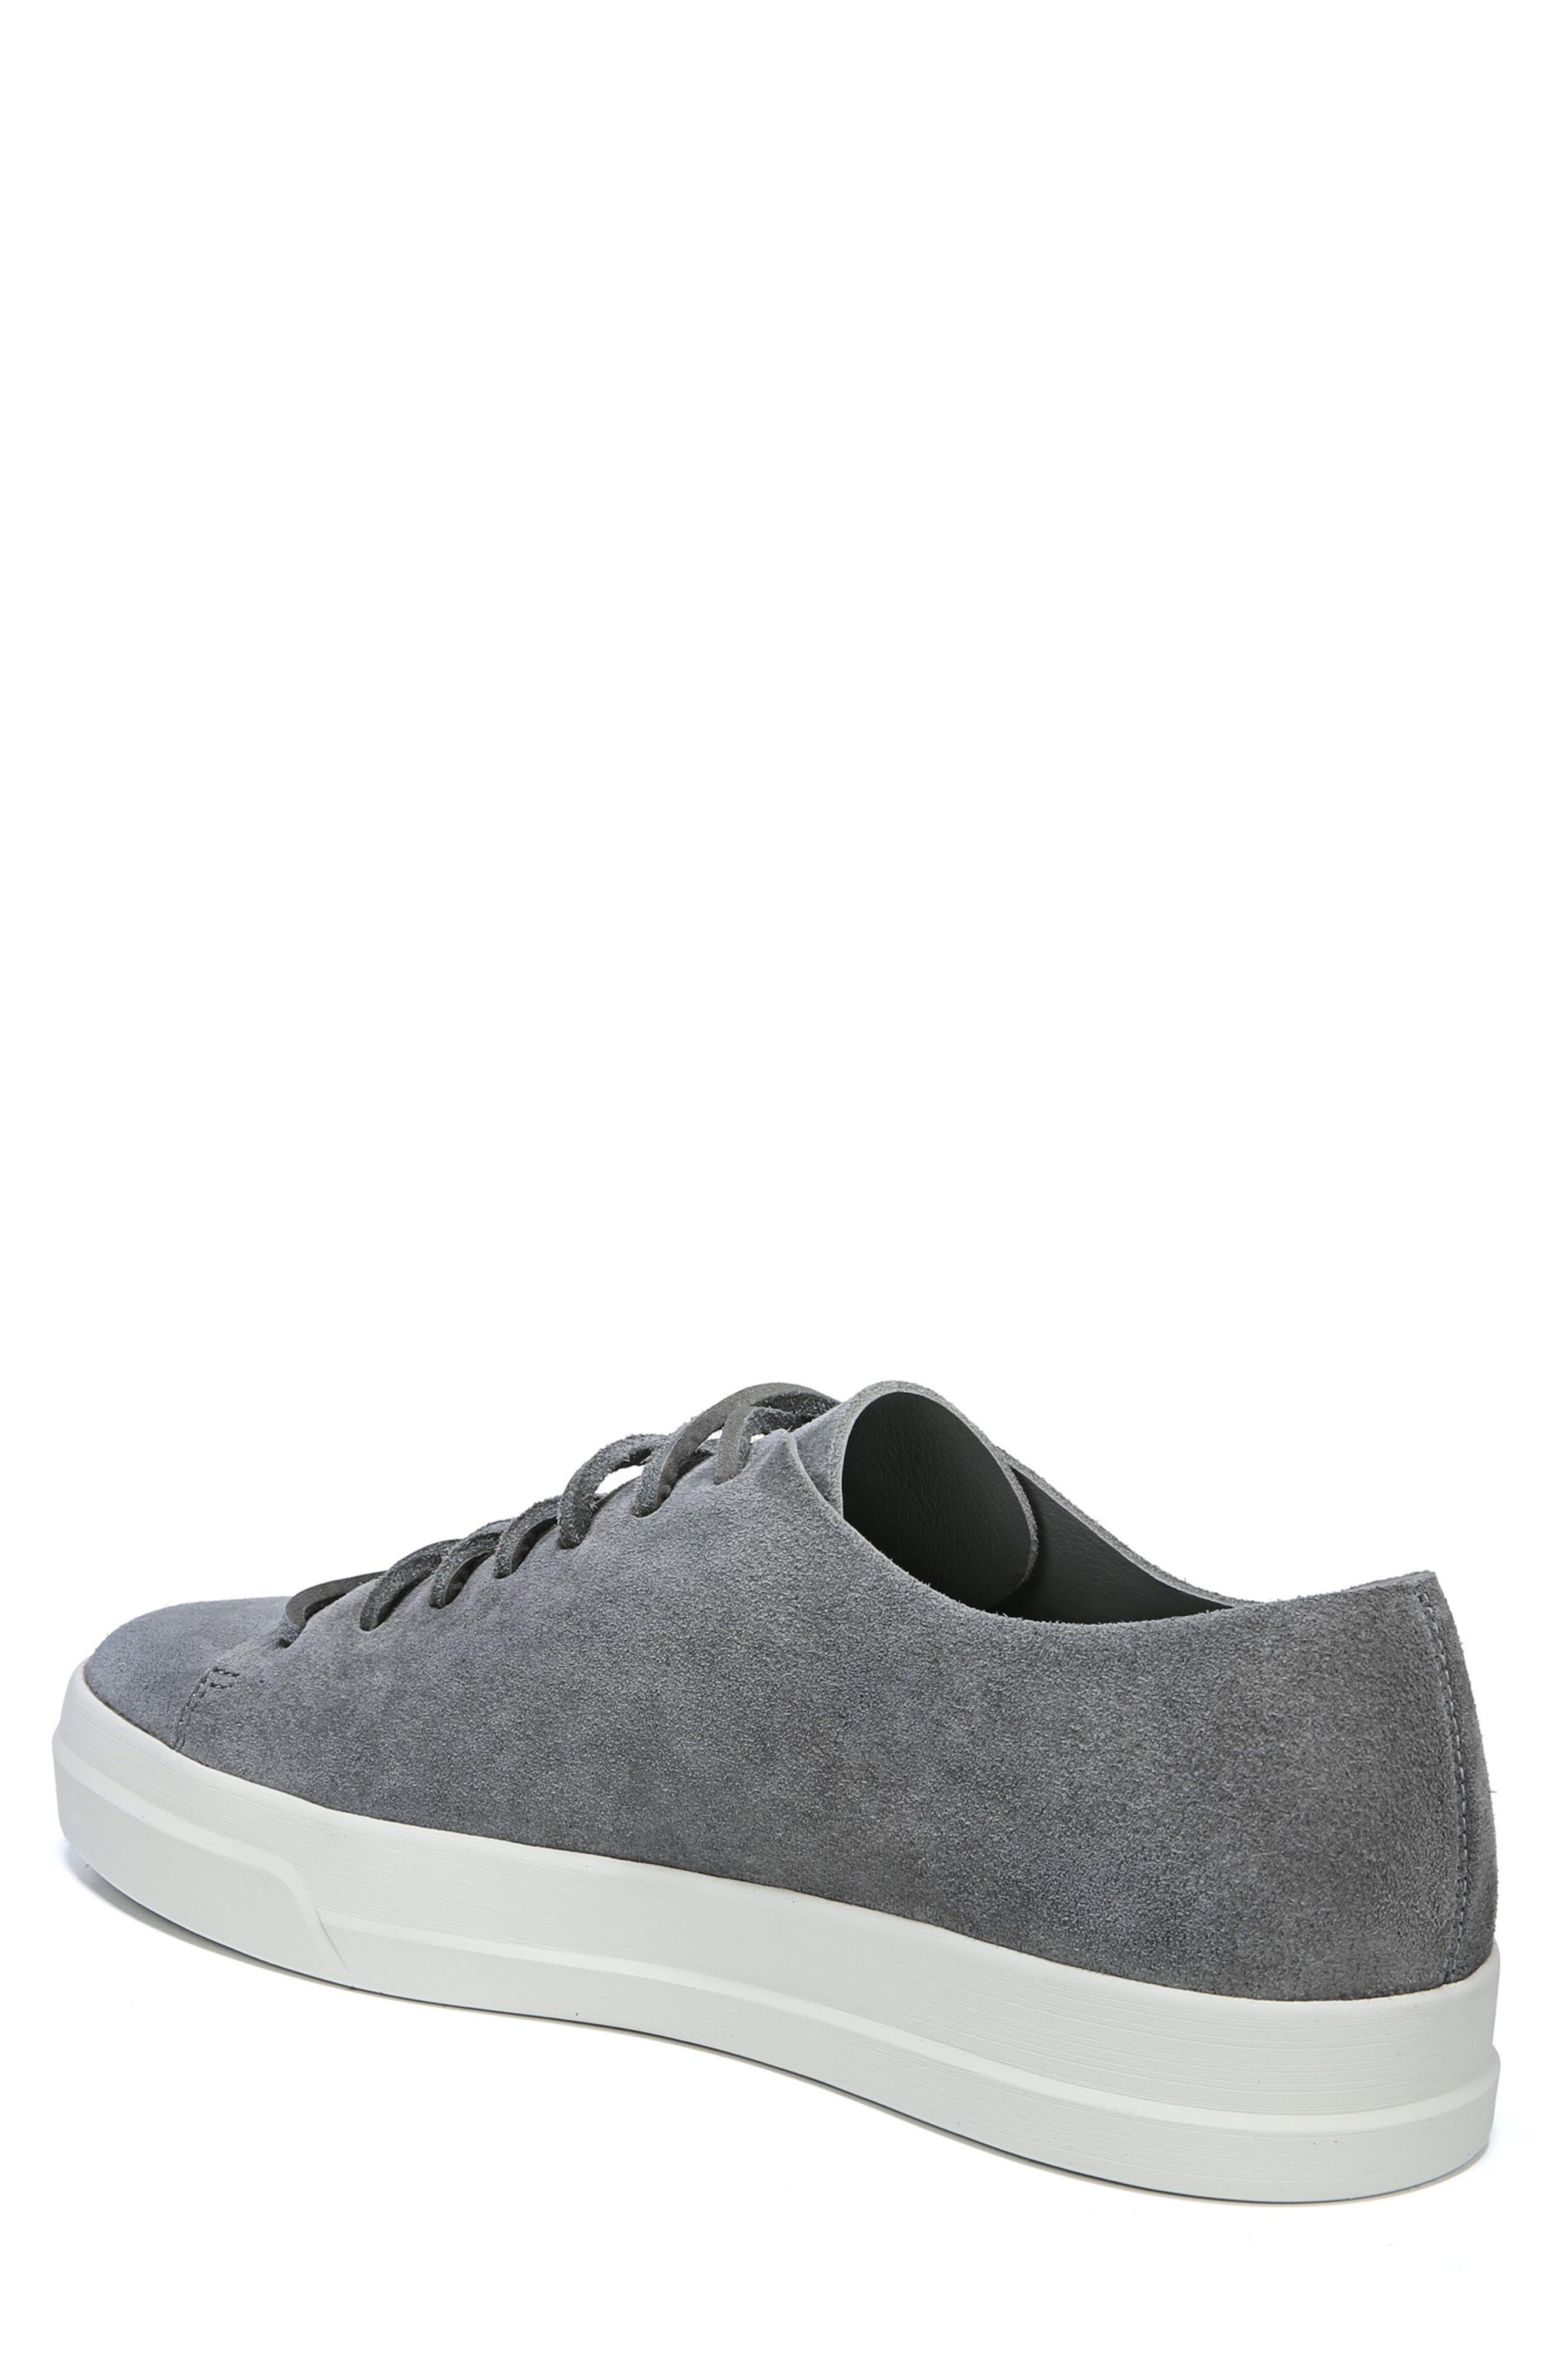 ,                             Copeland Sneaker,                             Alternate thumbnail 15, color,                             300